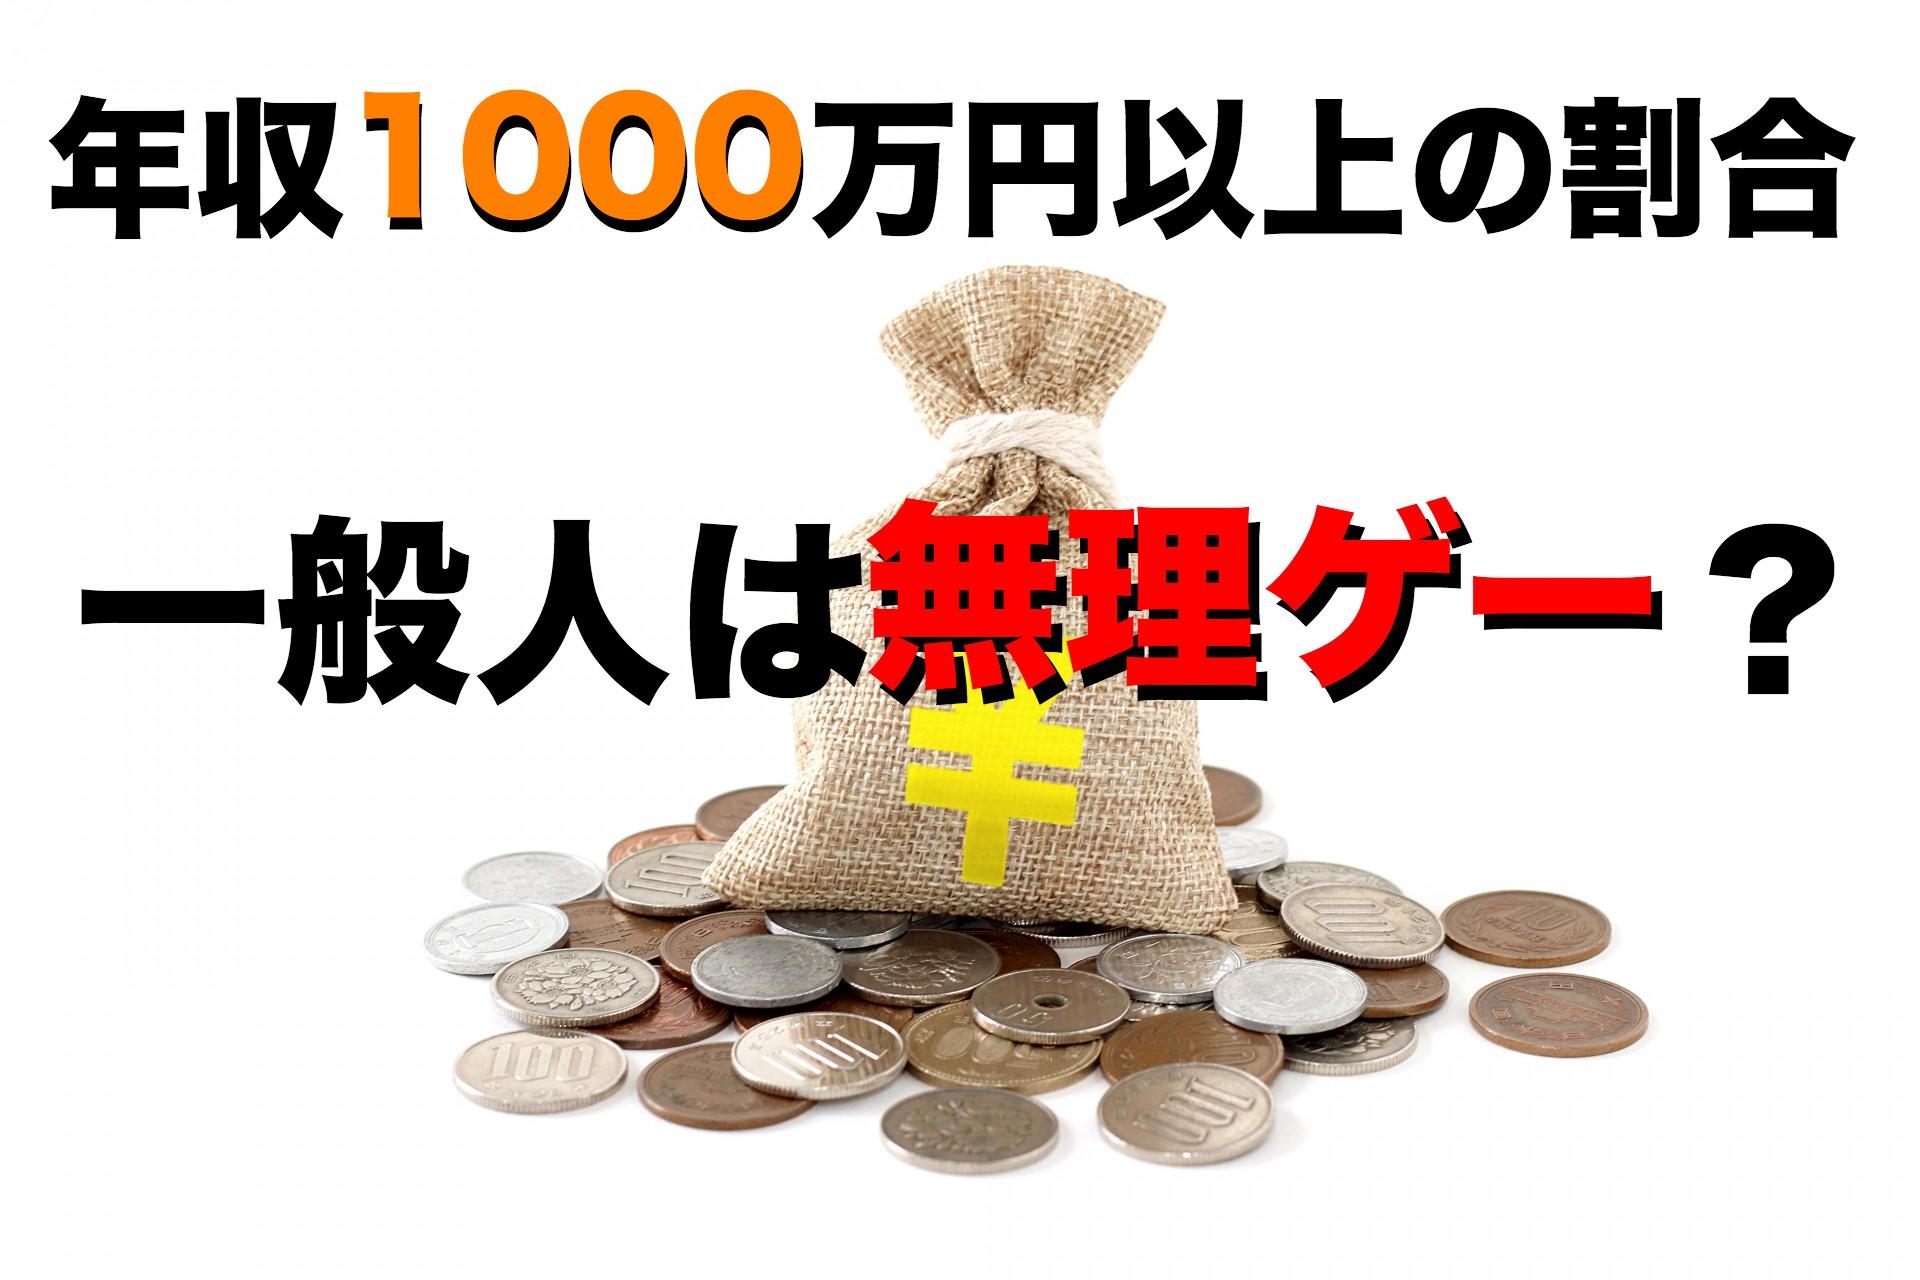 1000player-japan